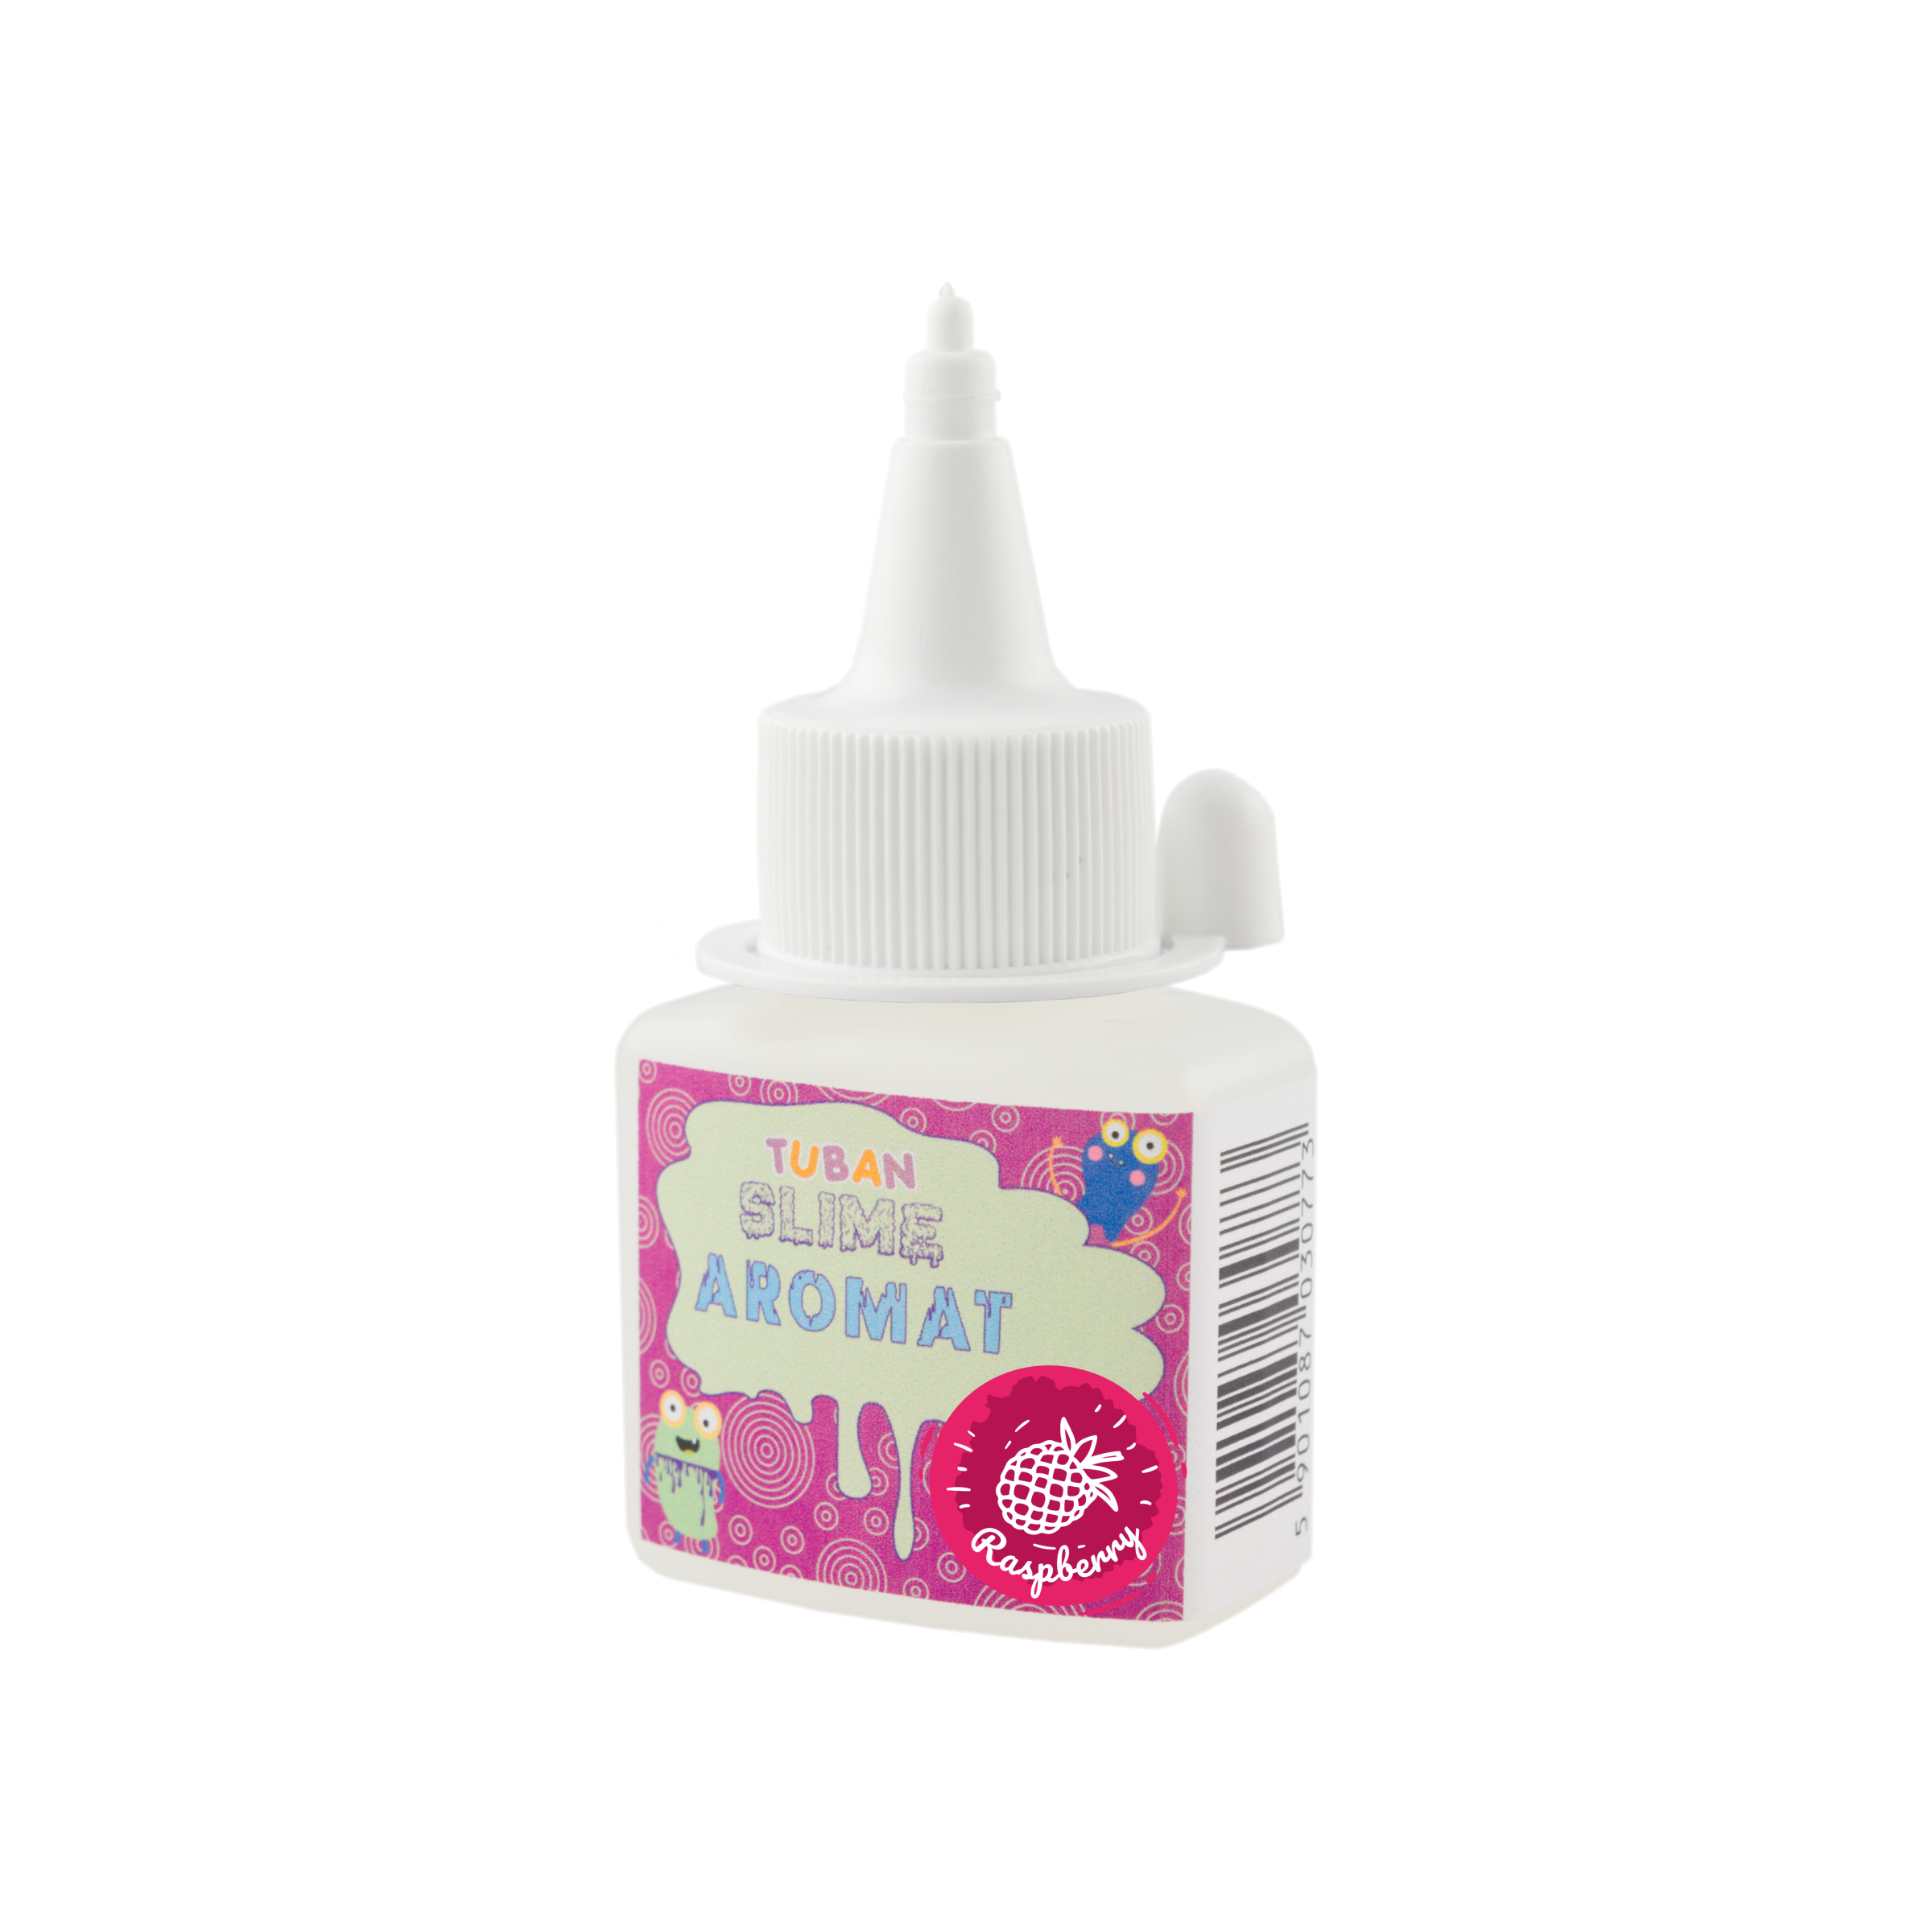 Tuban - Super Slime - Aroma mit Himbeerduft - 35 ml - by Jablka